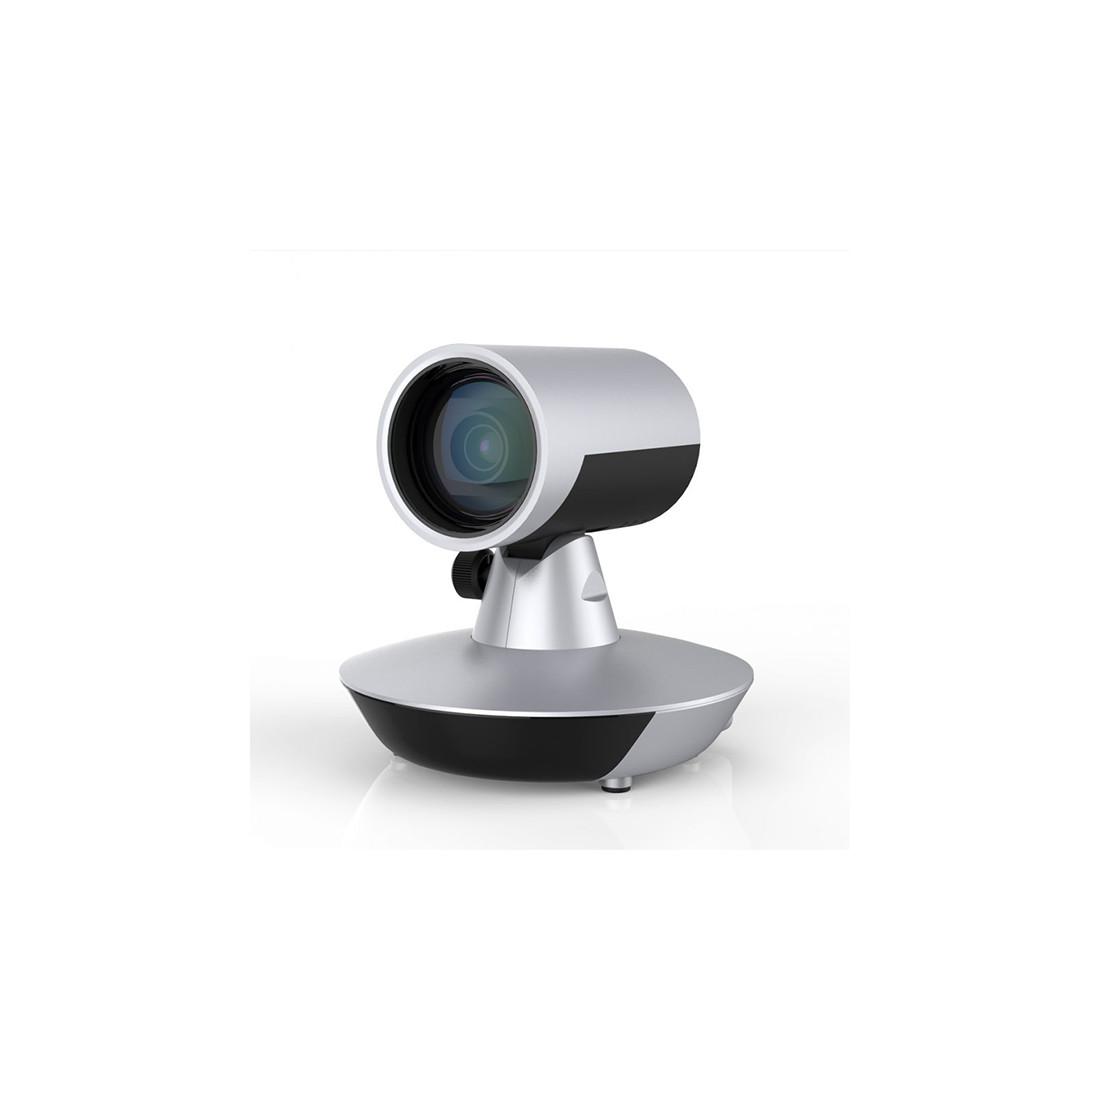 Minrray UV1202 video conference camera